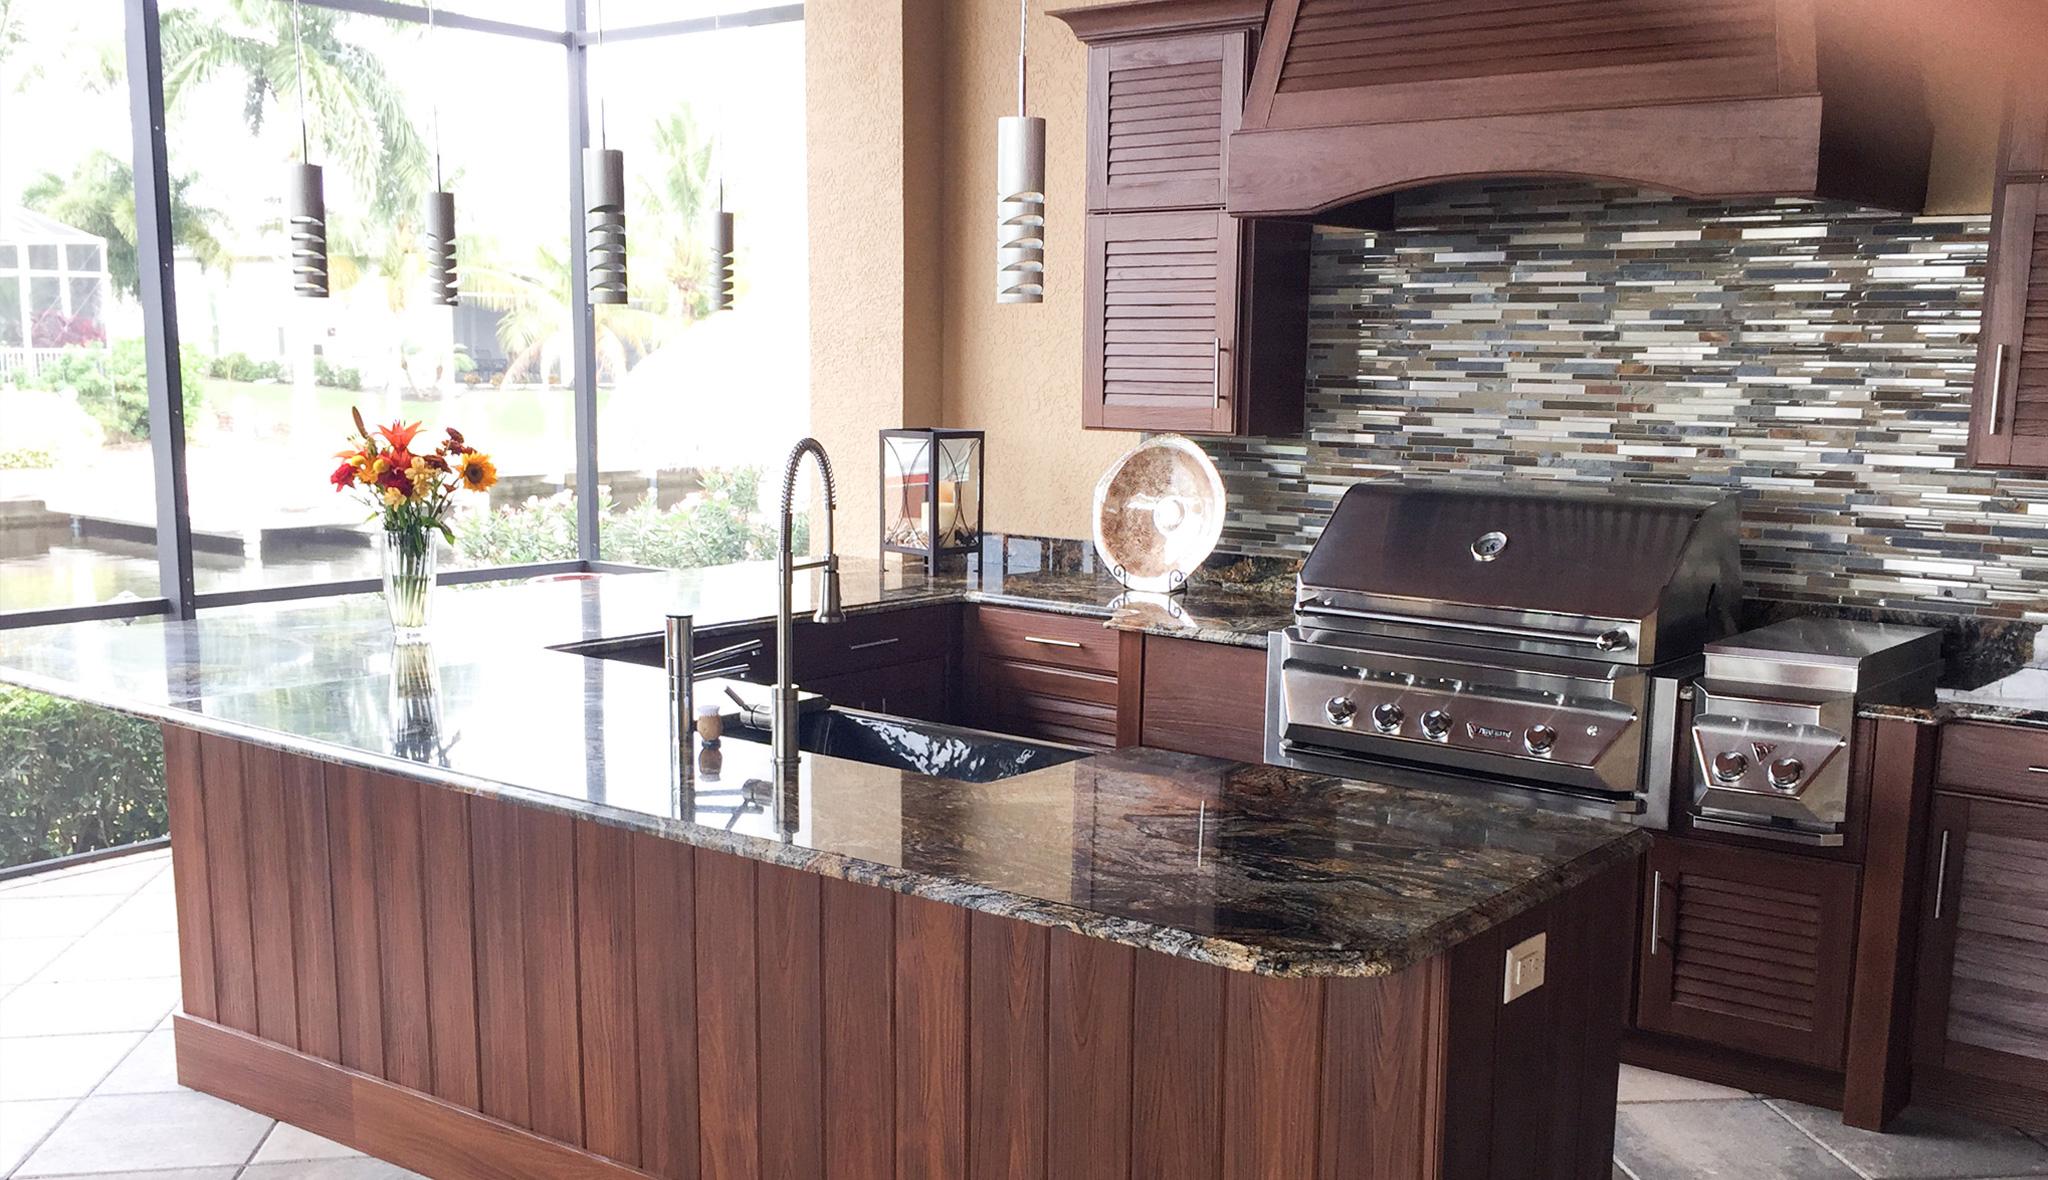 outdoor-summer-kitchen-cabinets-in-melbourne-FL-by-Hammond-Kitchens-and-Bath-slide-5